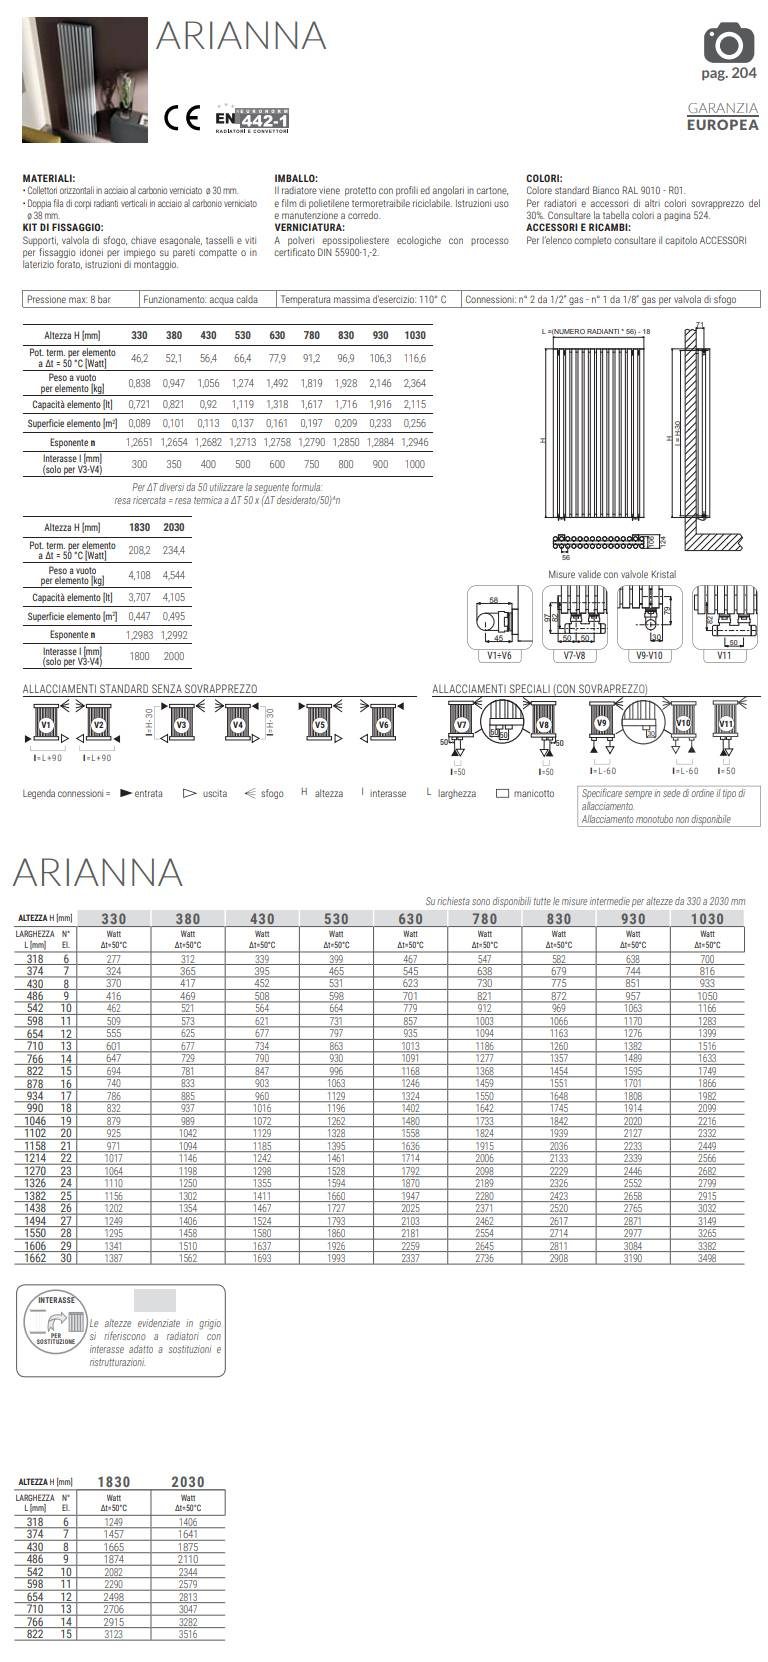 Blech-Technik-Heizkörper-Tulnier-Arianna-Cordivari